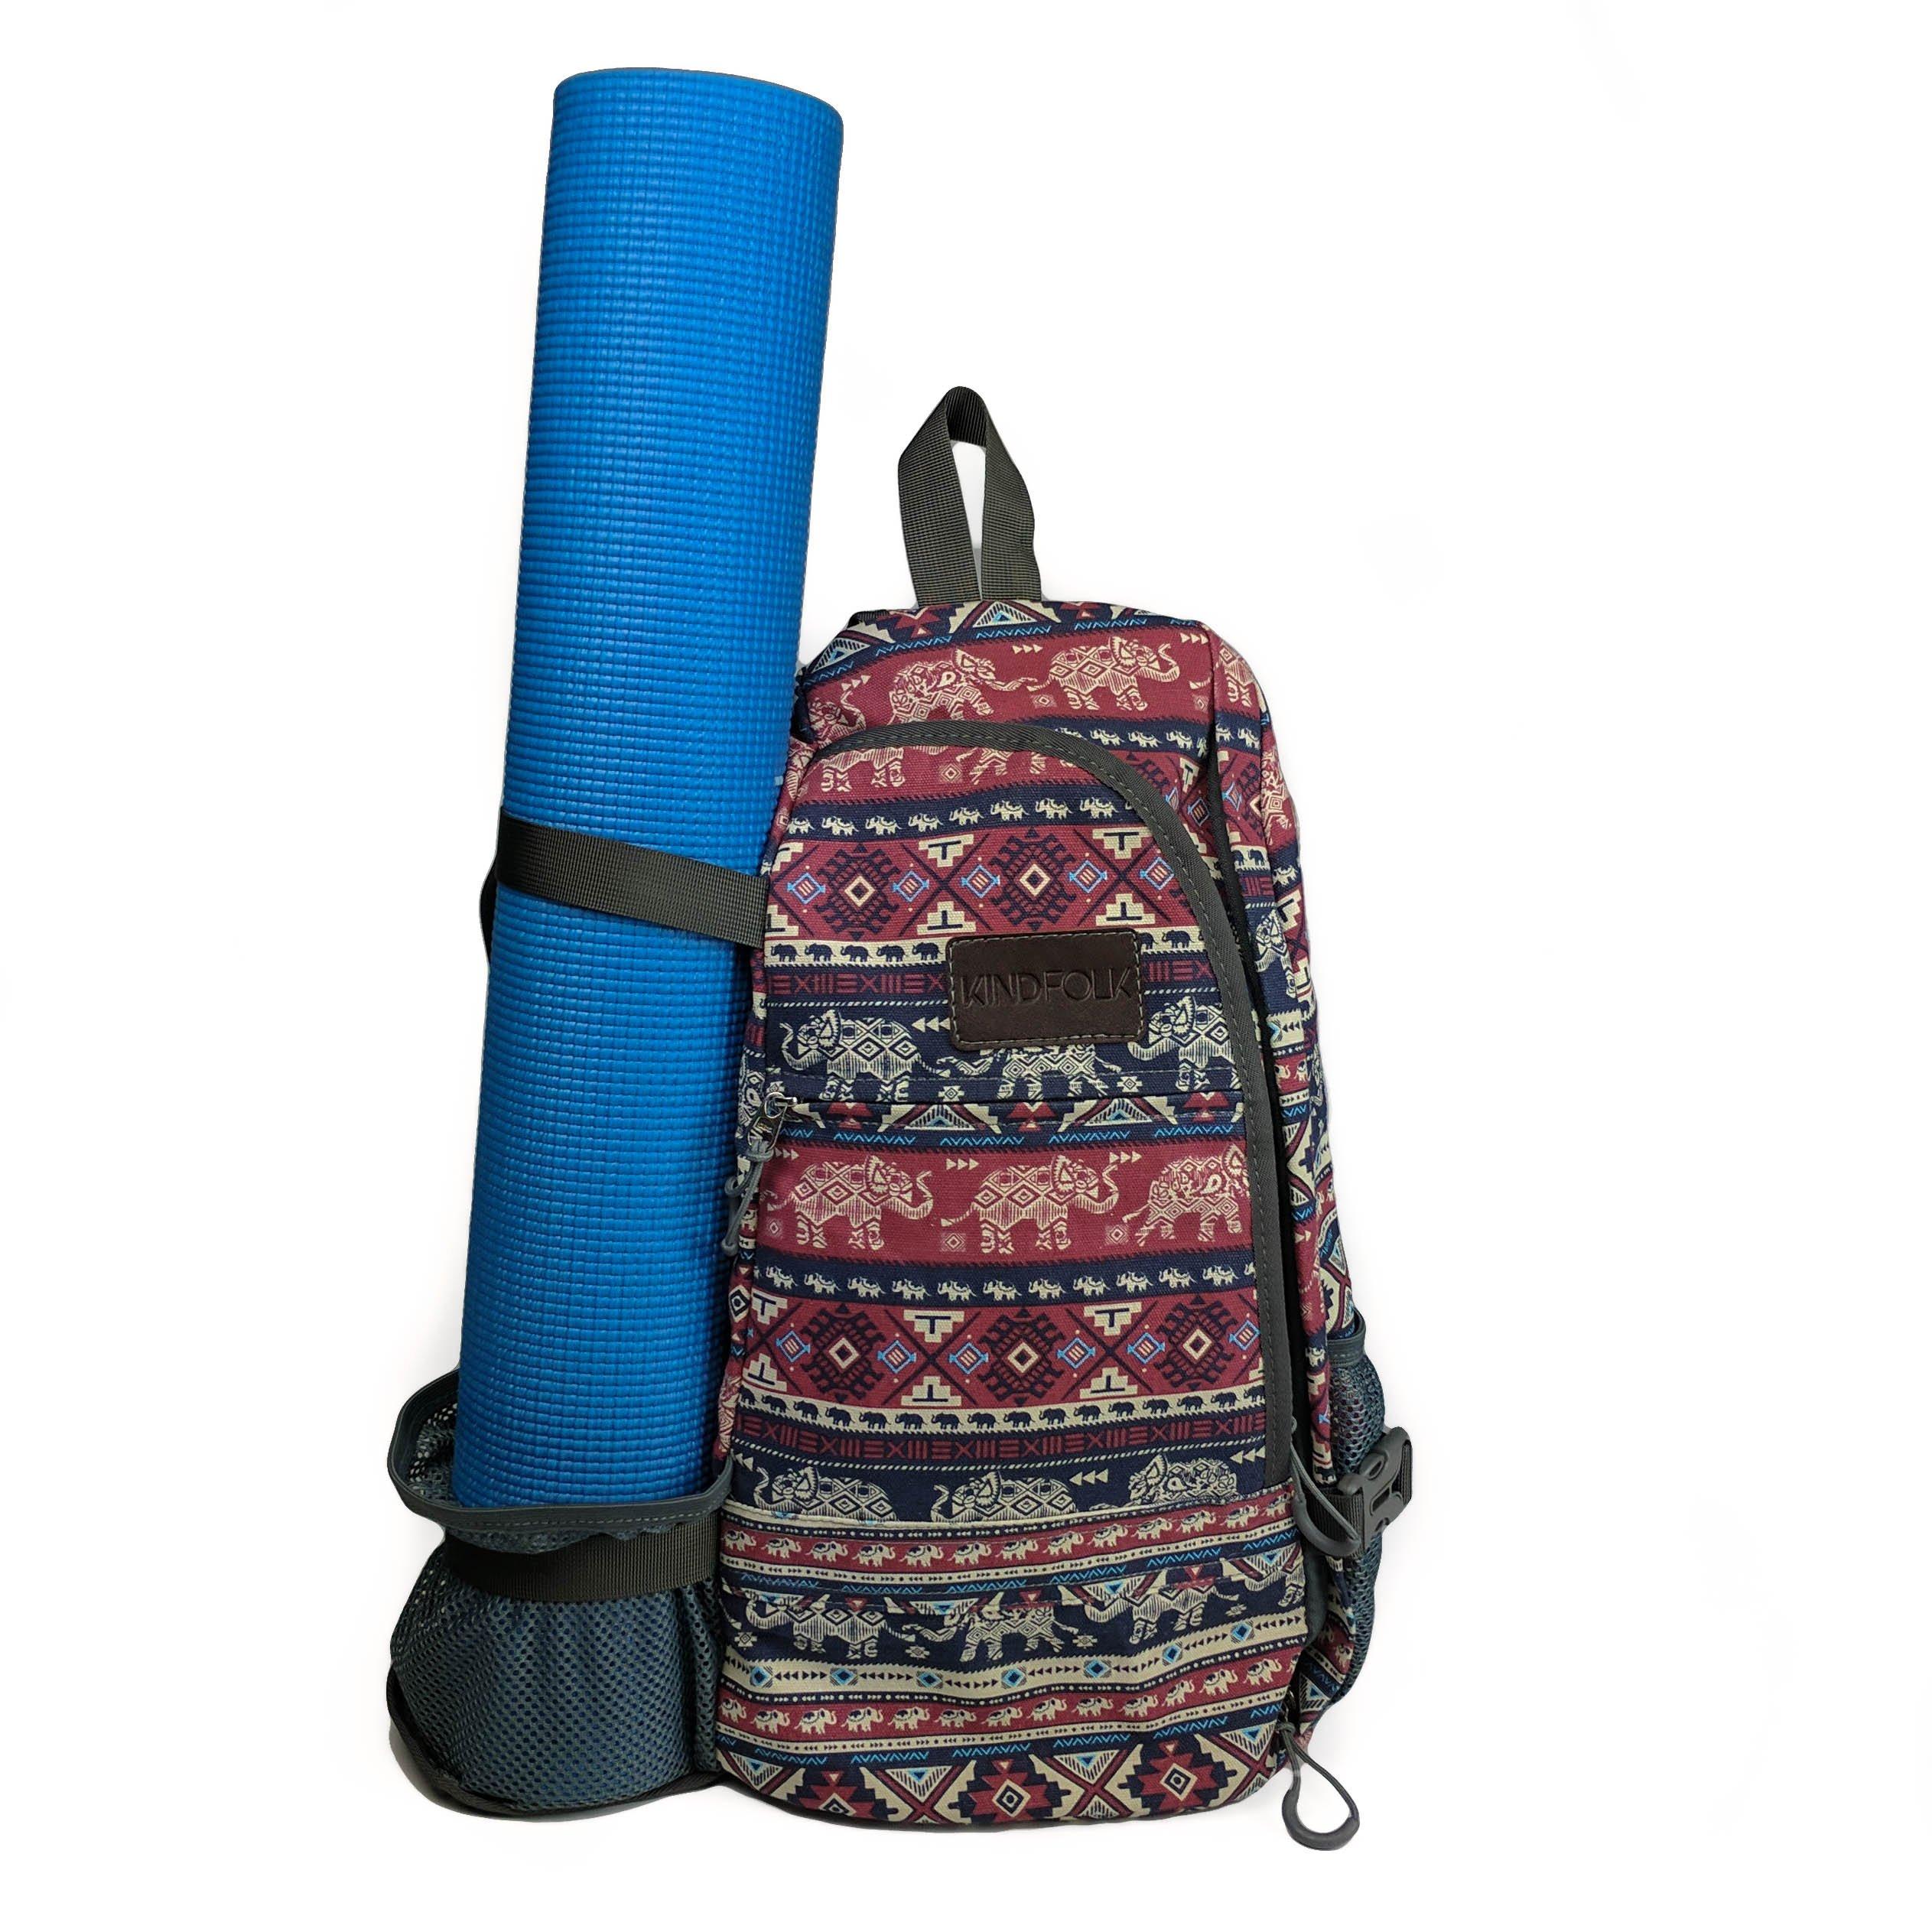 Kindfolk Yoga Mat Backpack Crossbody Style One Strap (Karma)